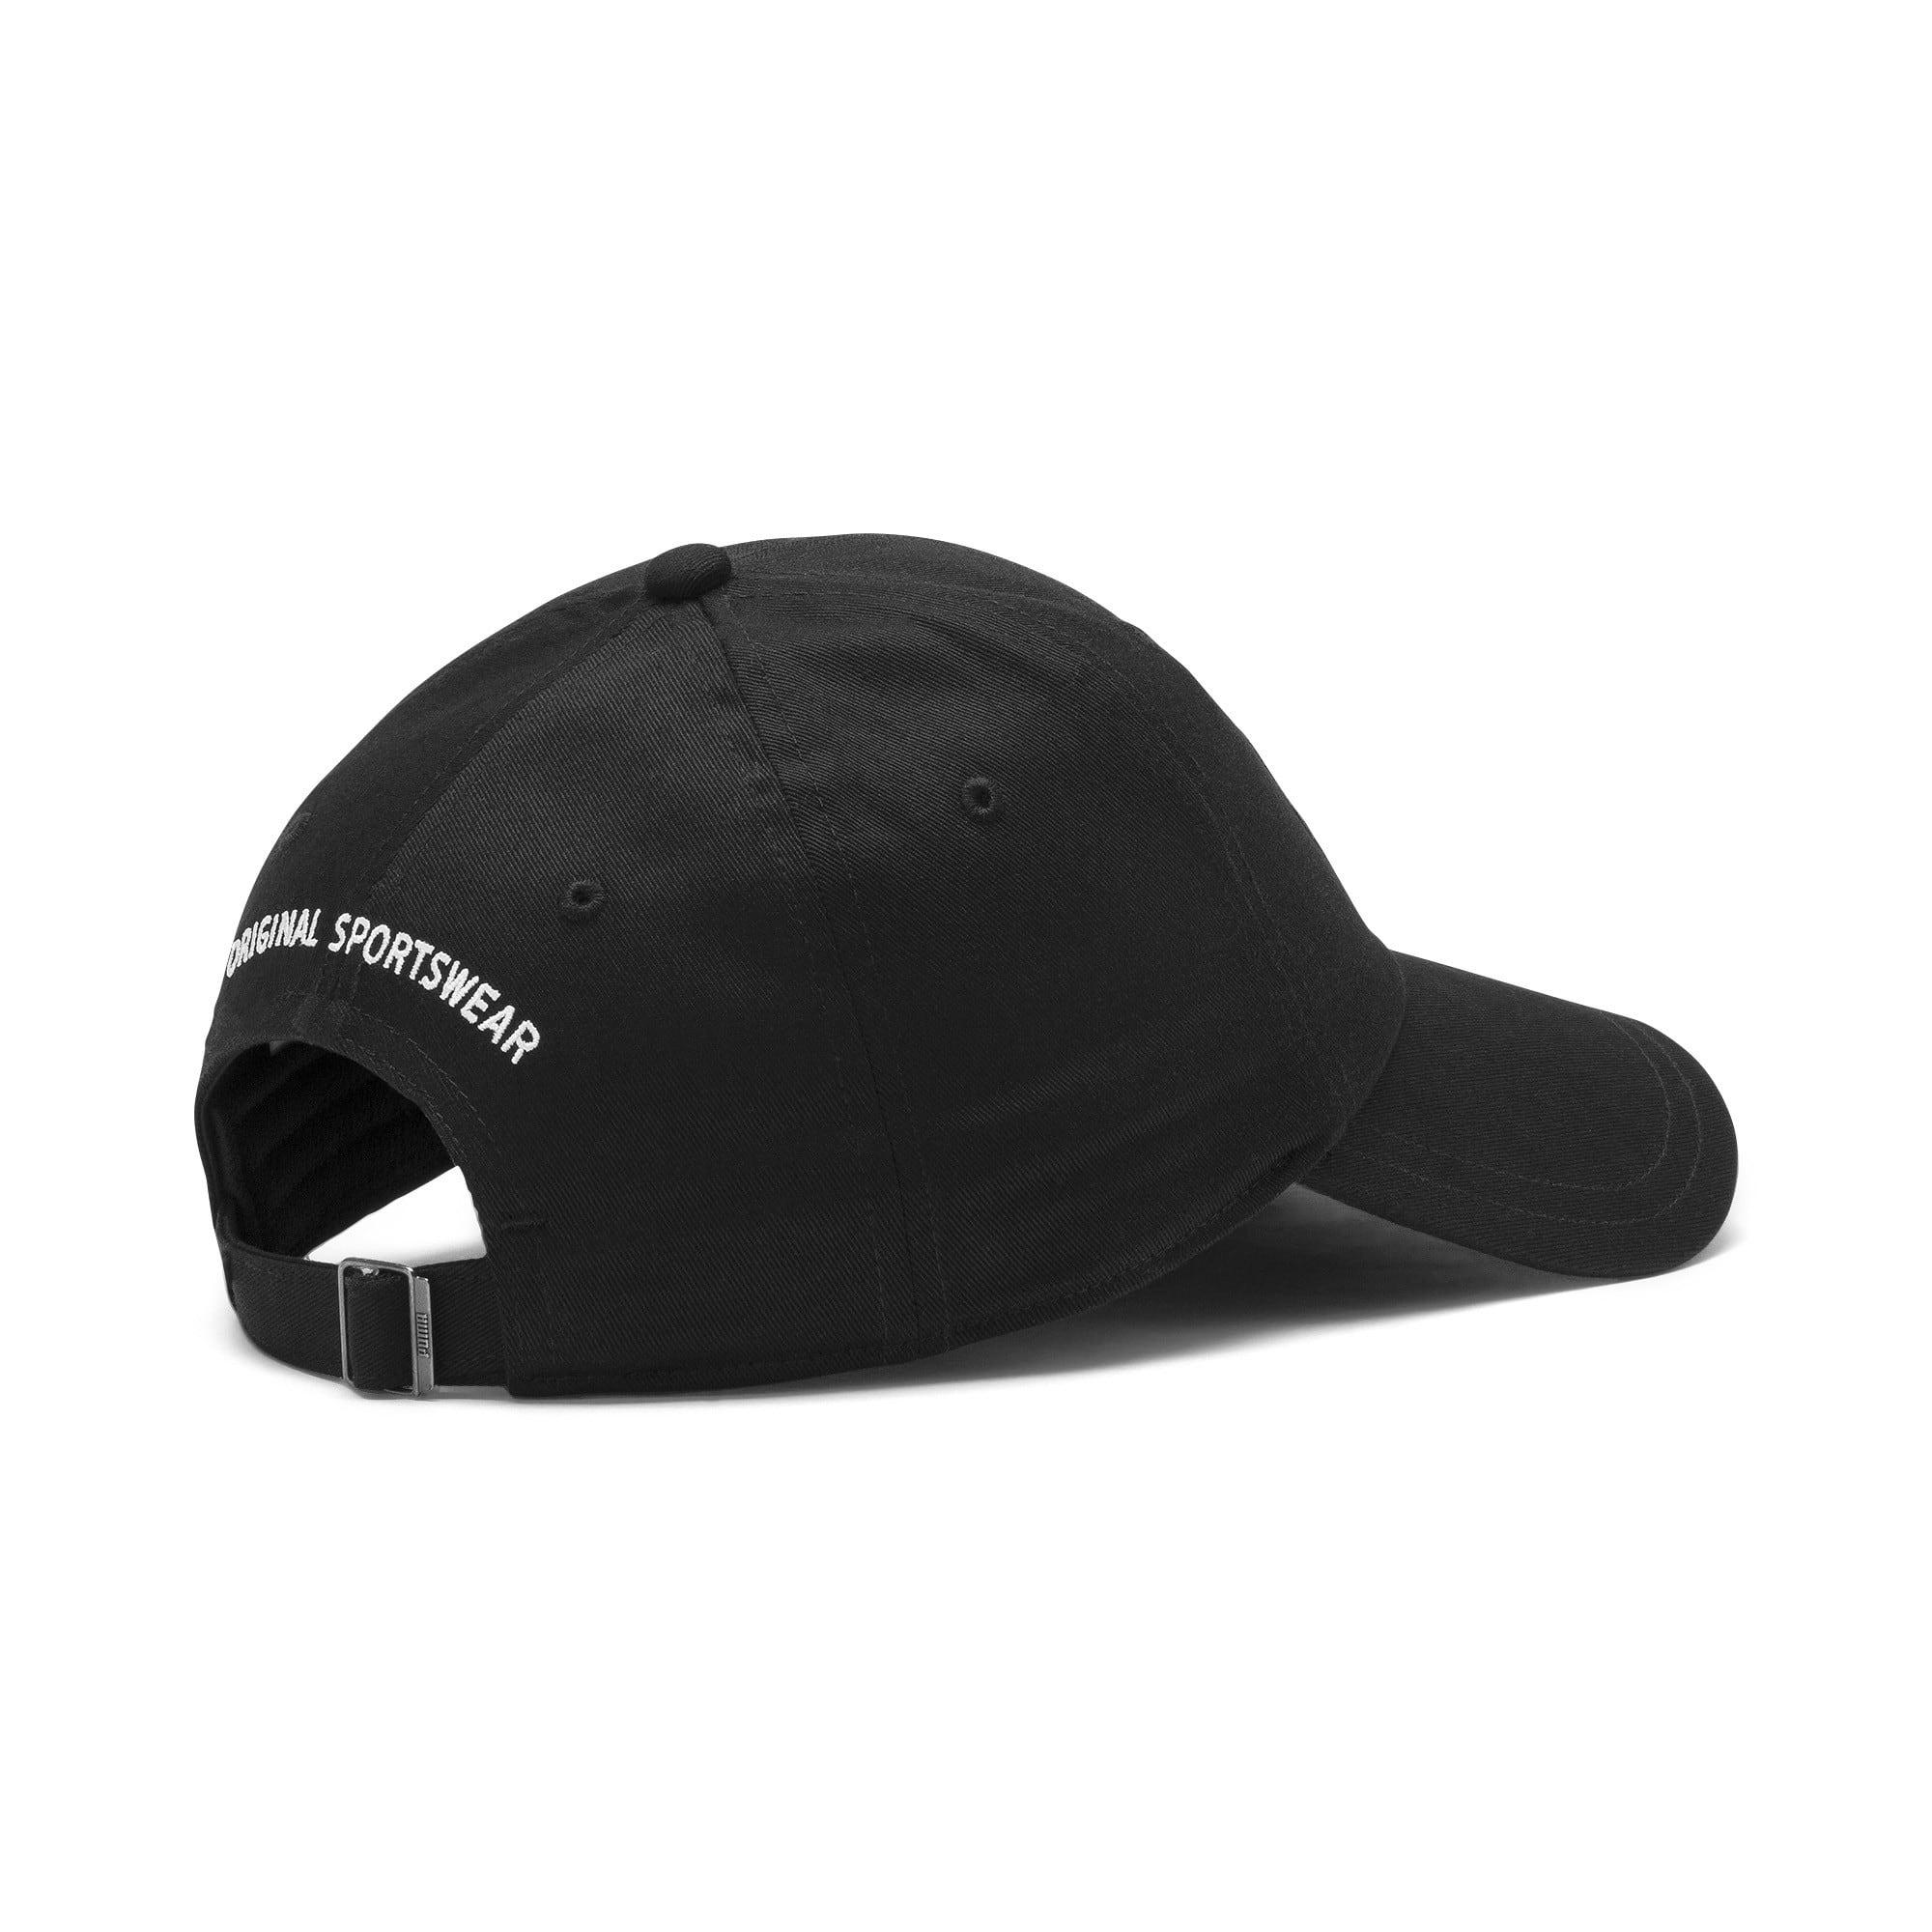 Thumbnail 3 of Style Stoffcap, Puma Black, medium